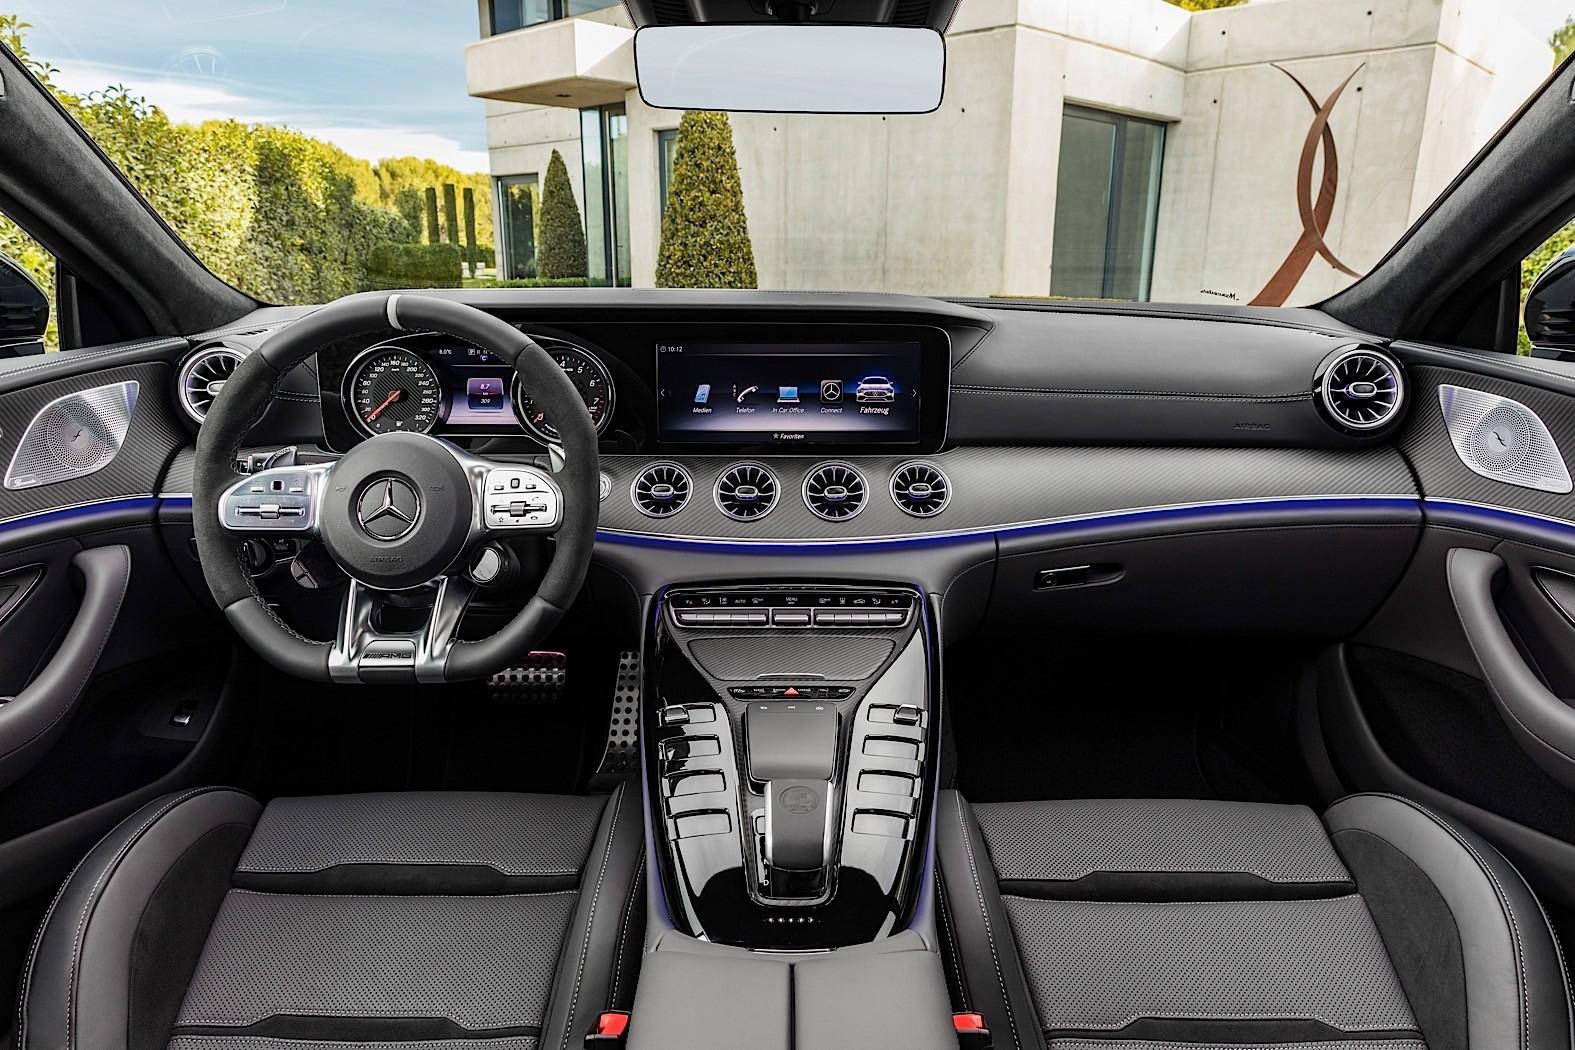 2019 mercedes amg gt 4 door coupe goes live in geneva autoevolution. Black Bedroom Furniture Sets. Home Design Ideas